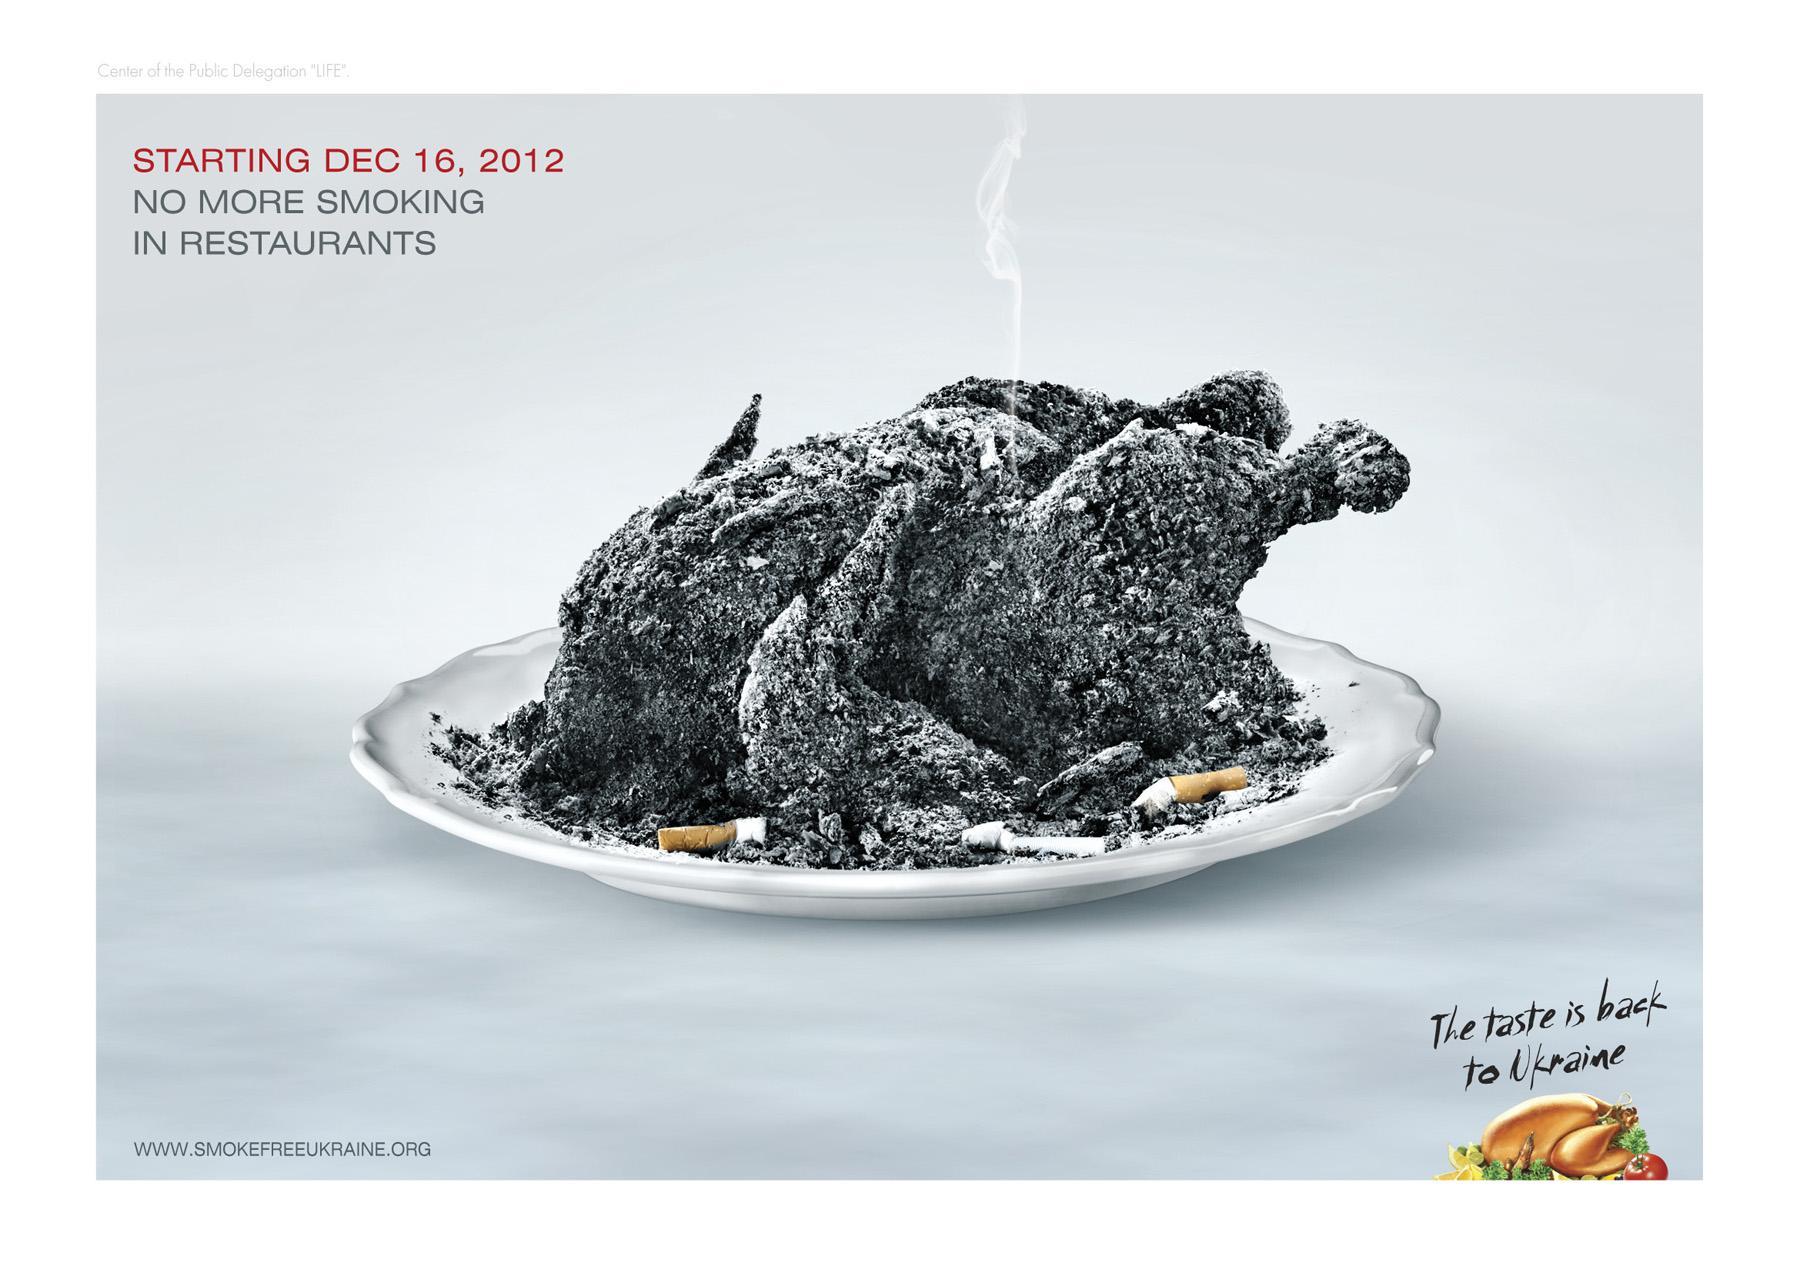 smokefreeukraine Print Ad -  The taste is back to Ukraine